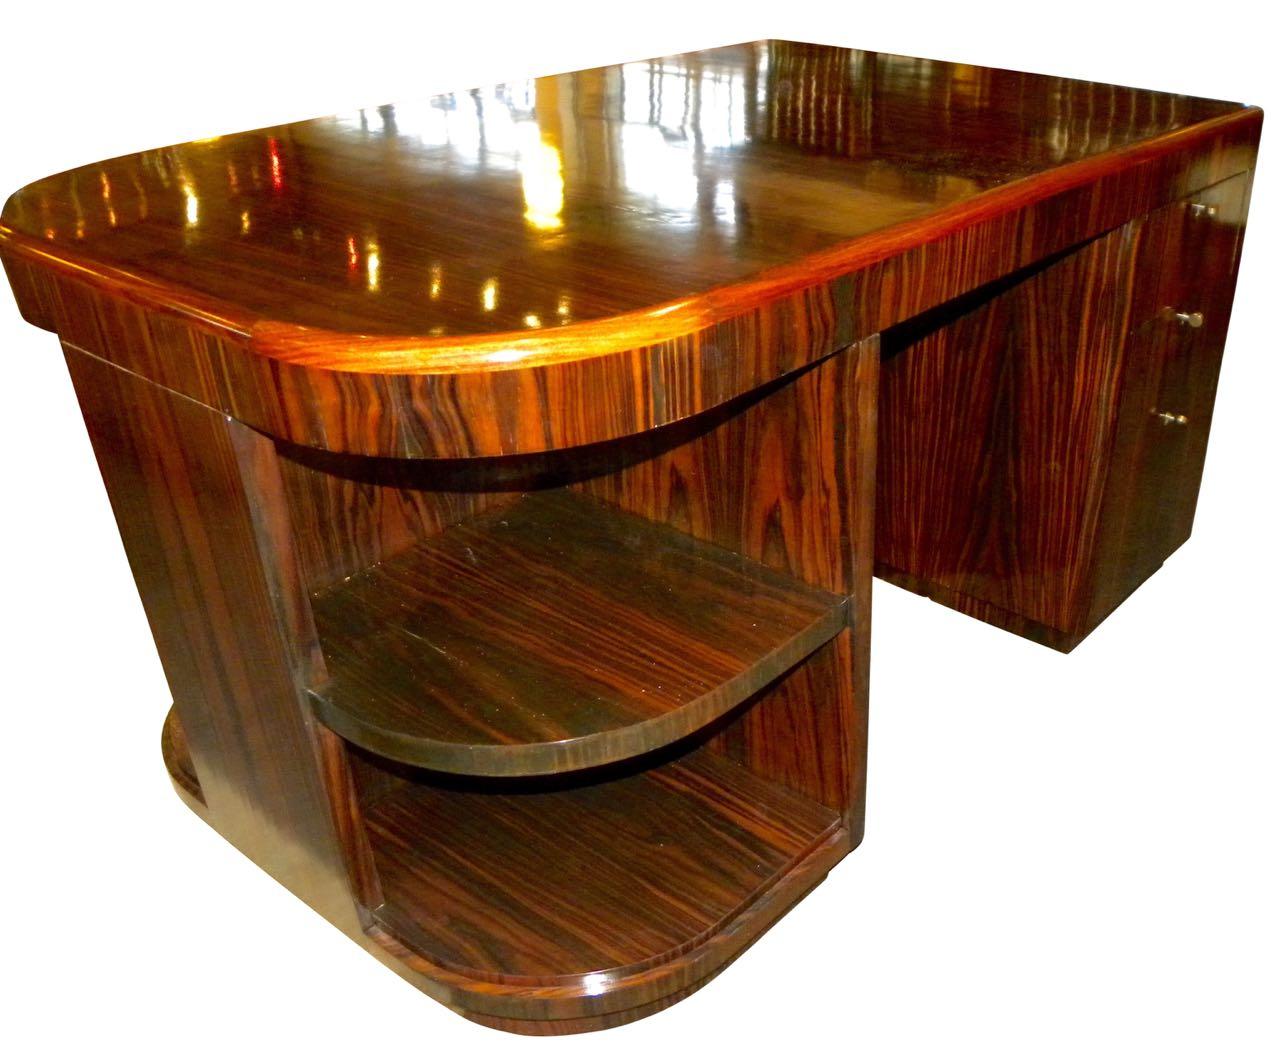 Art deco style furniture - Original French Macassar Art Deco Partners Desk